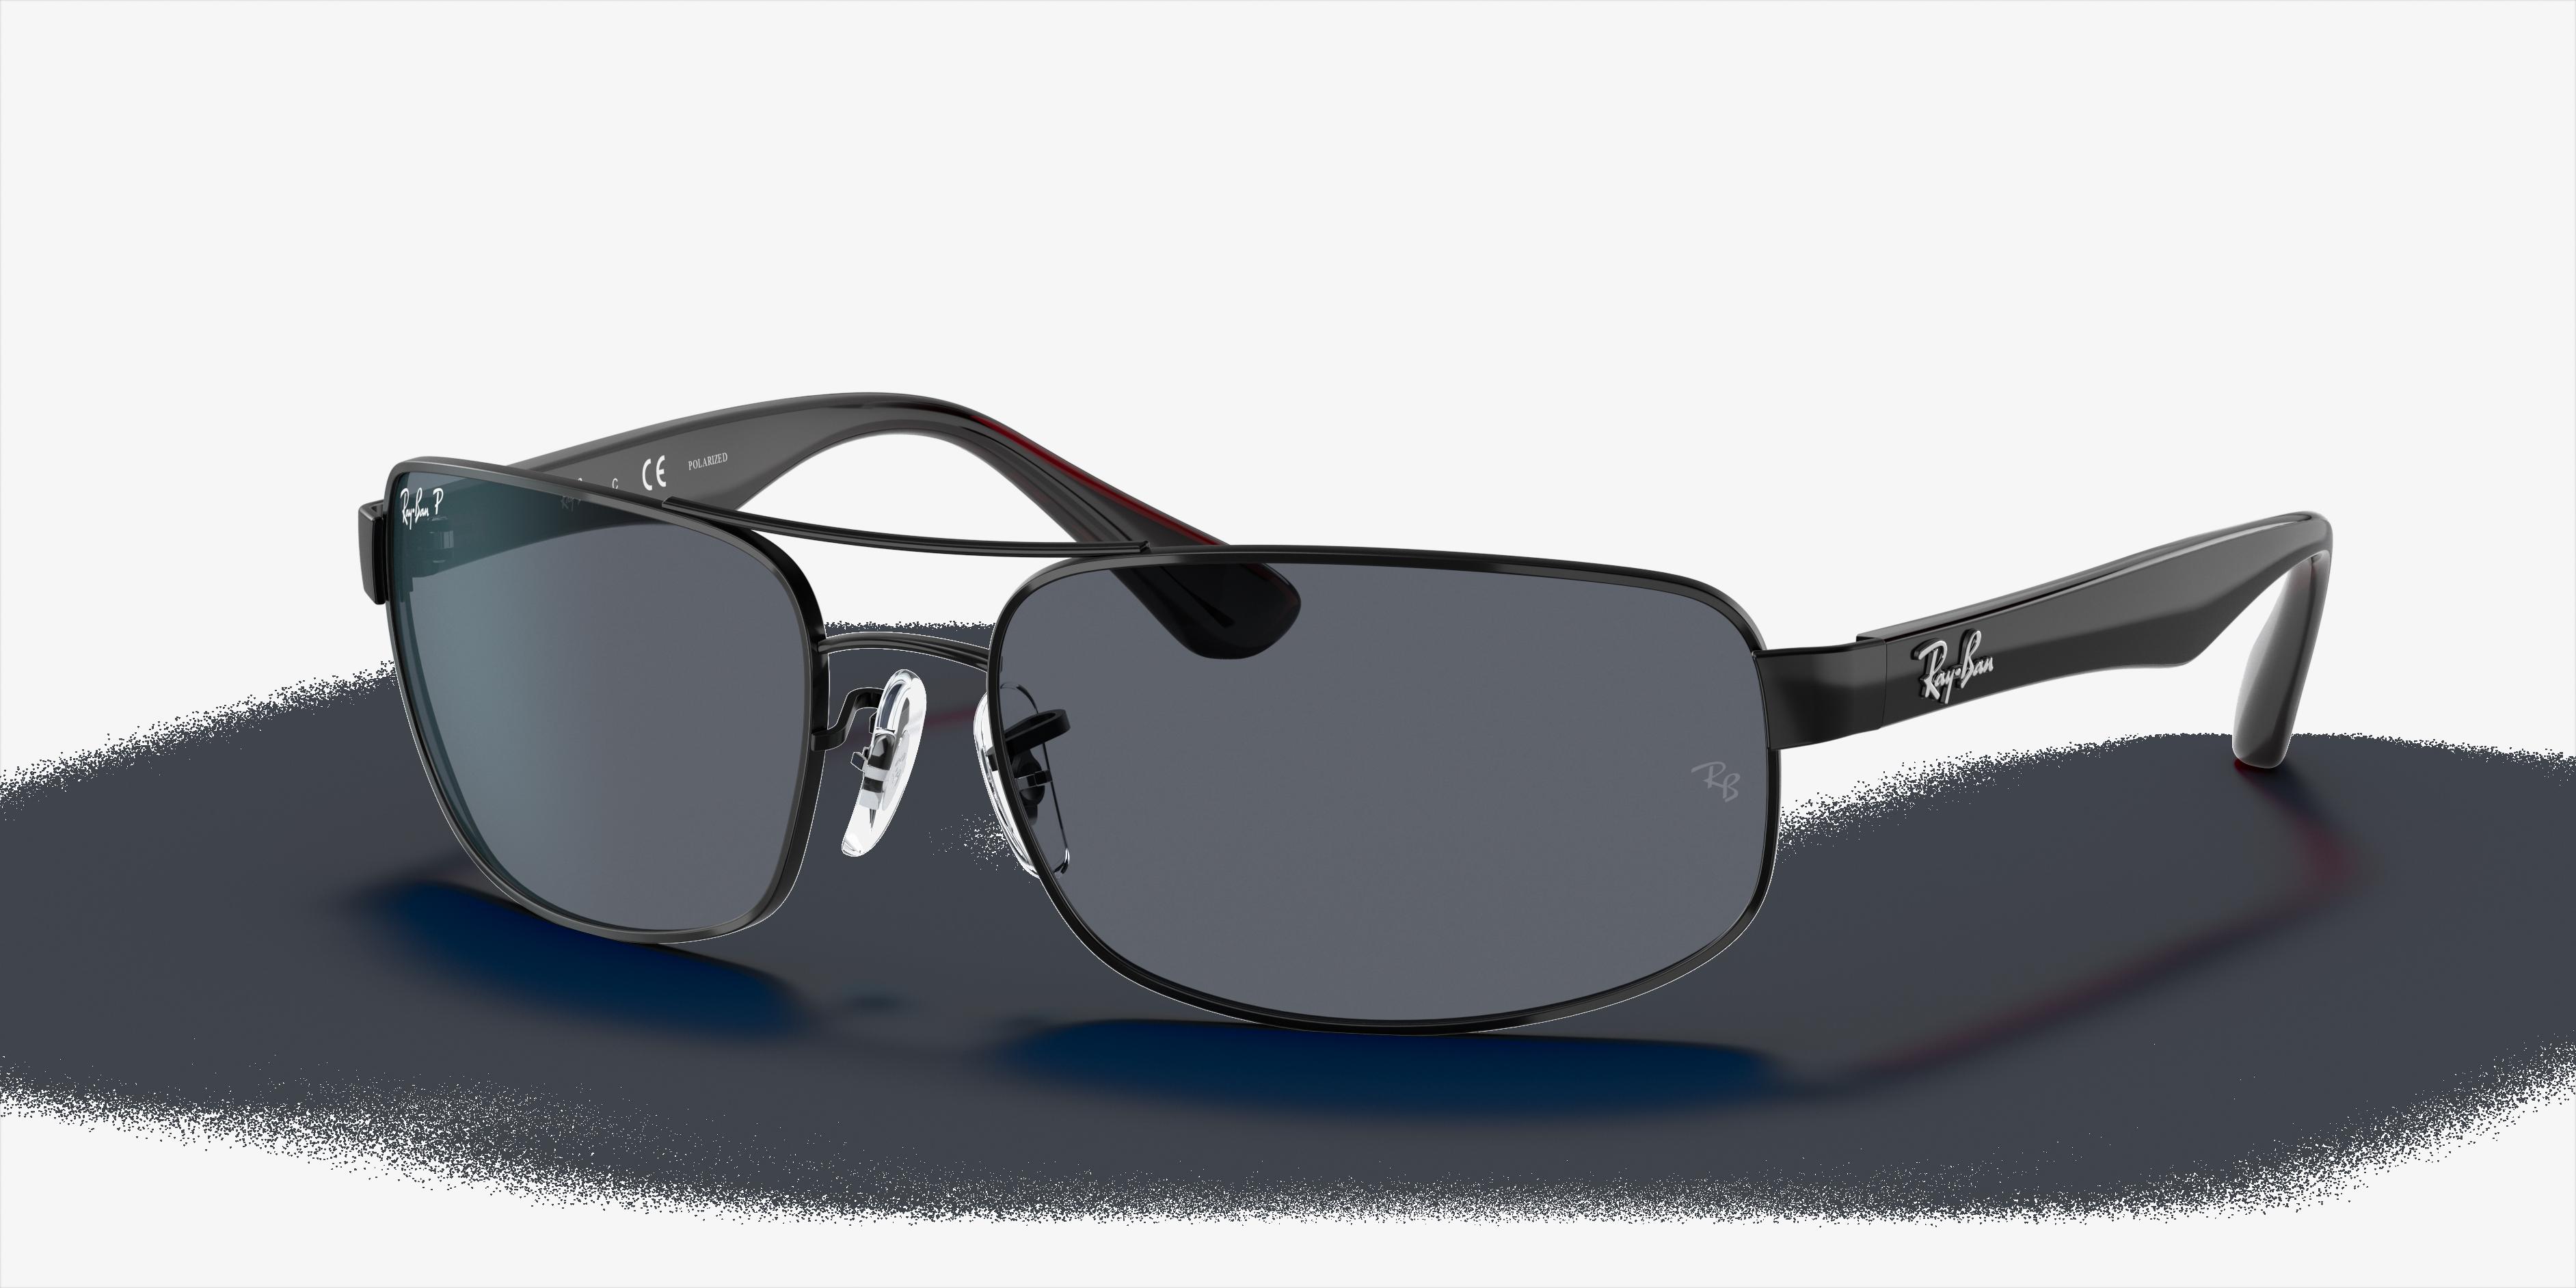 Ray-Ban Rb3445 Black, Polarized Gray Lenses - RB3445